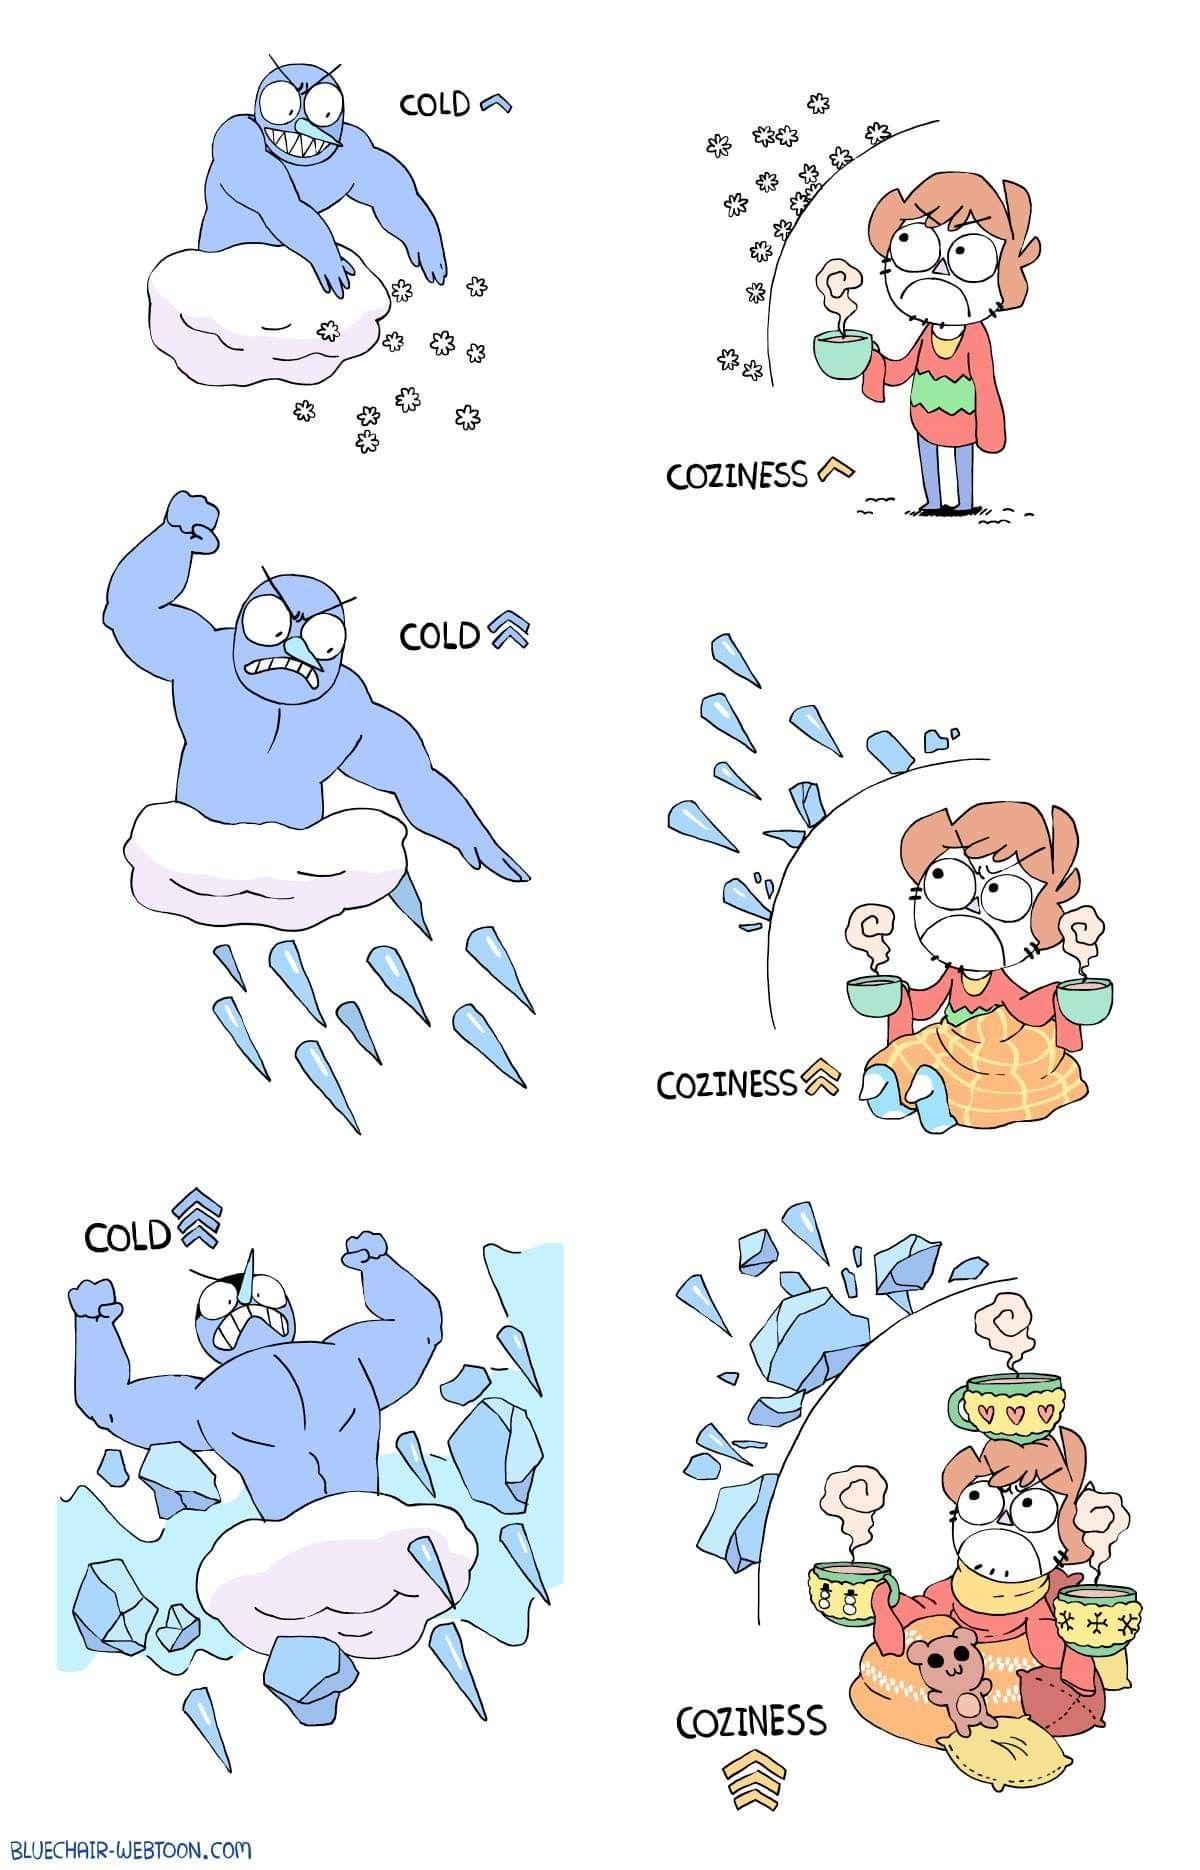 Cold Cozinnes Memes Divertidos Meme Divertido Meme Gracioso